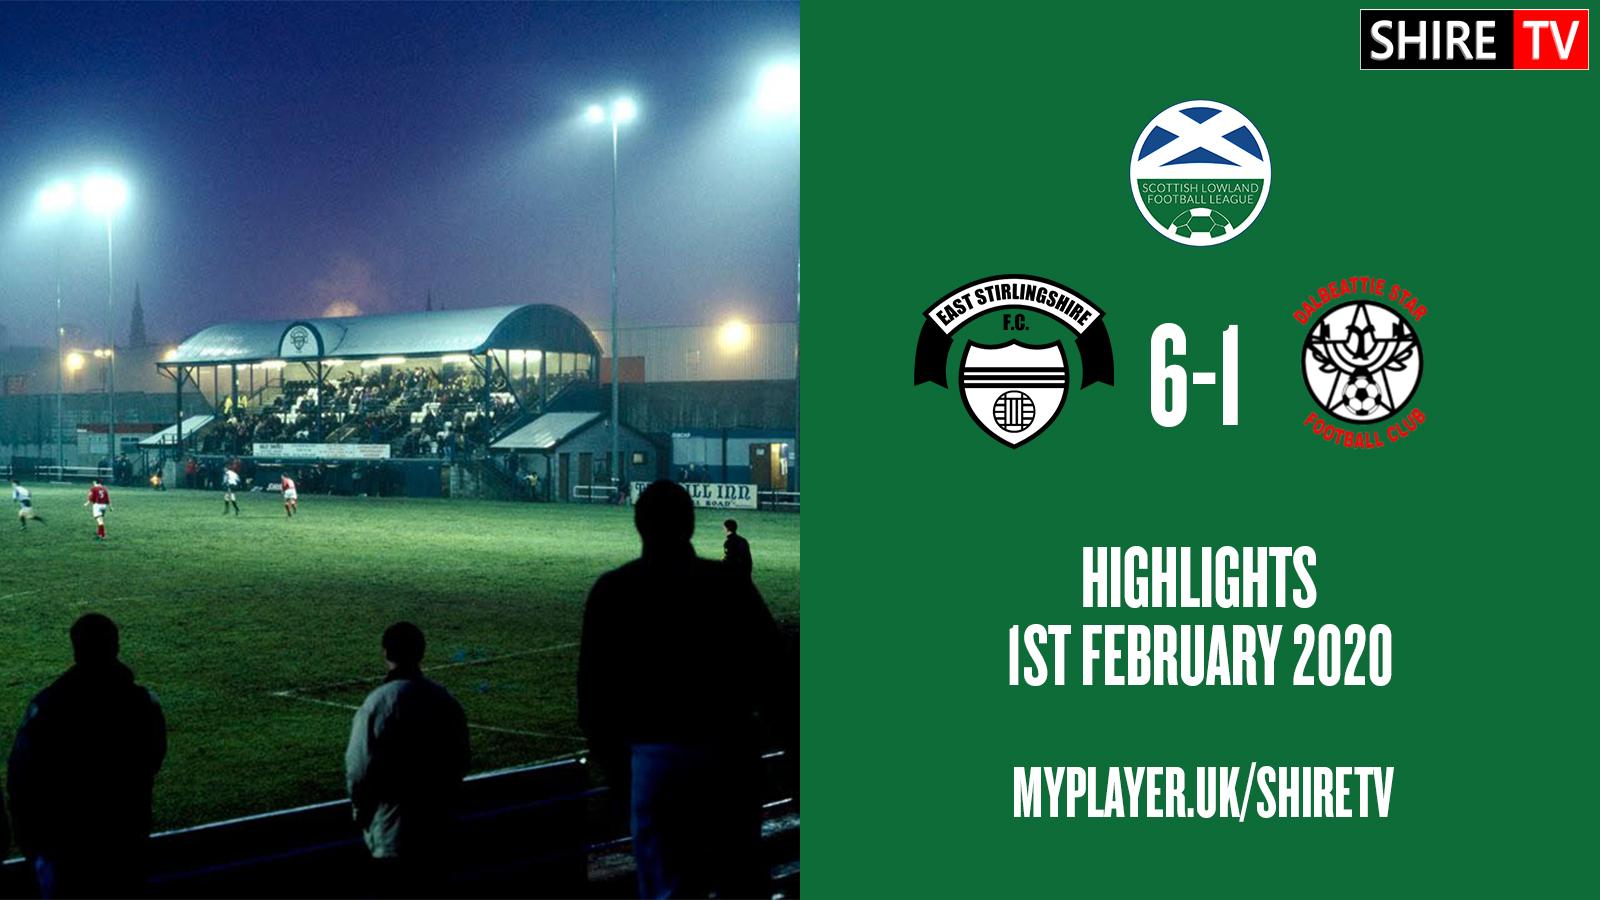 East Stirlingshire V Dalbeattie Star (Lowland League 1st February 2020)